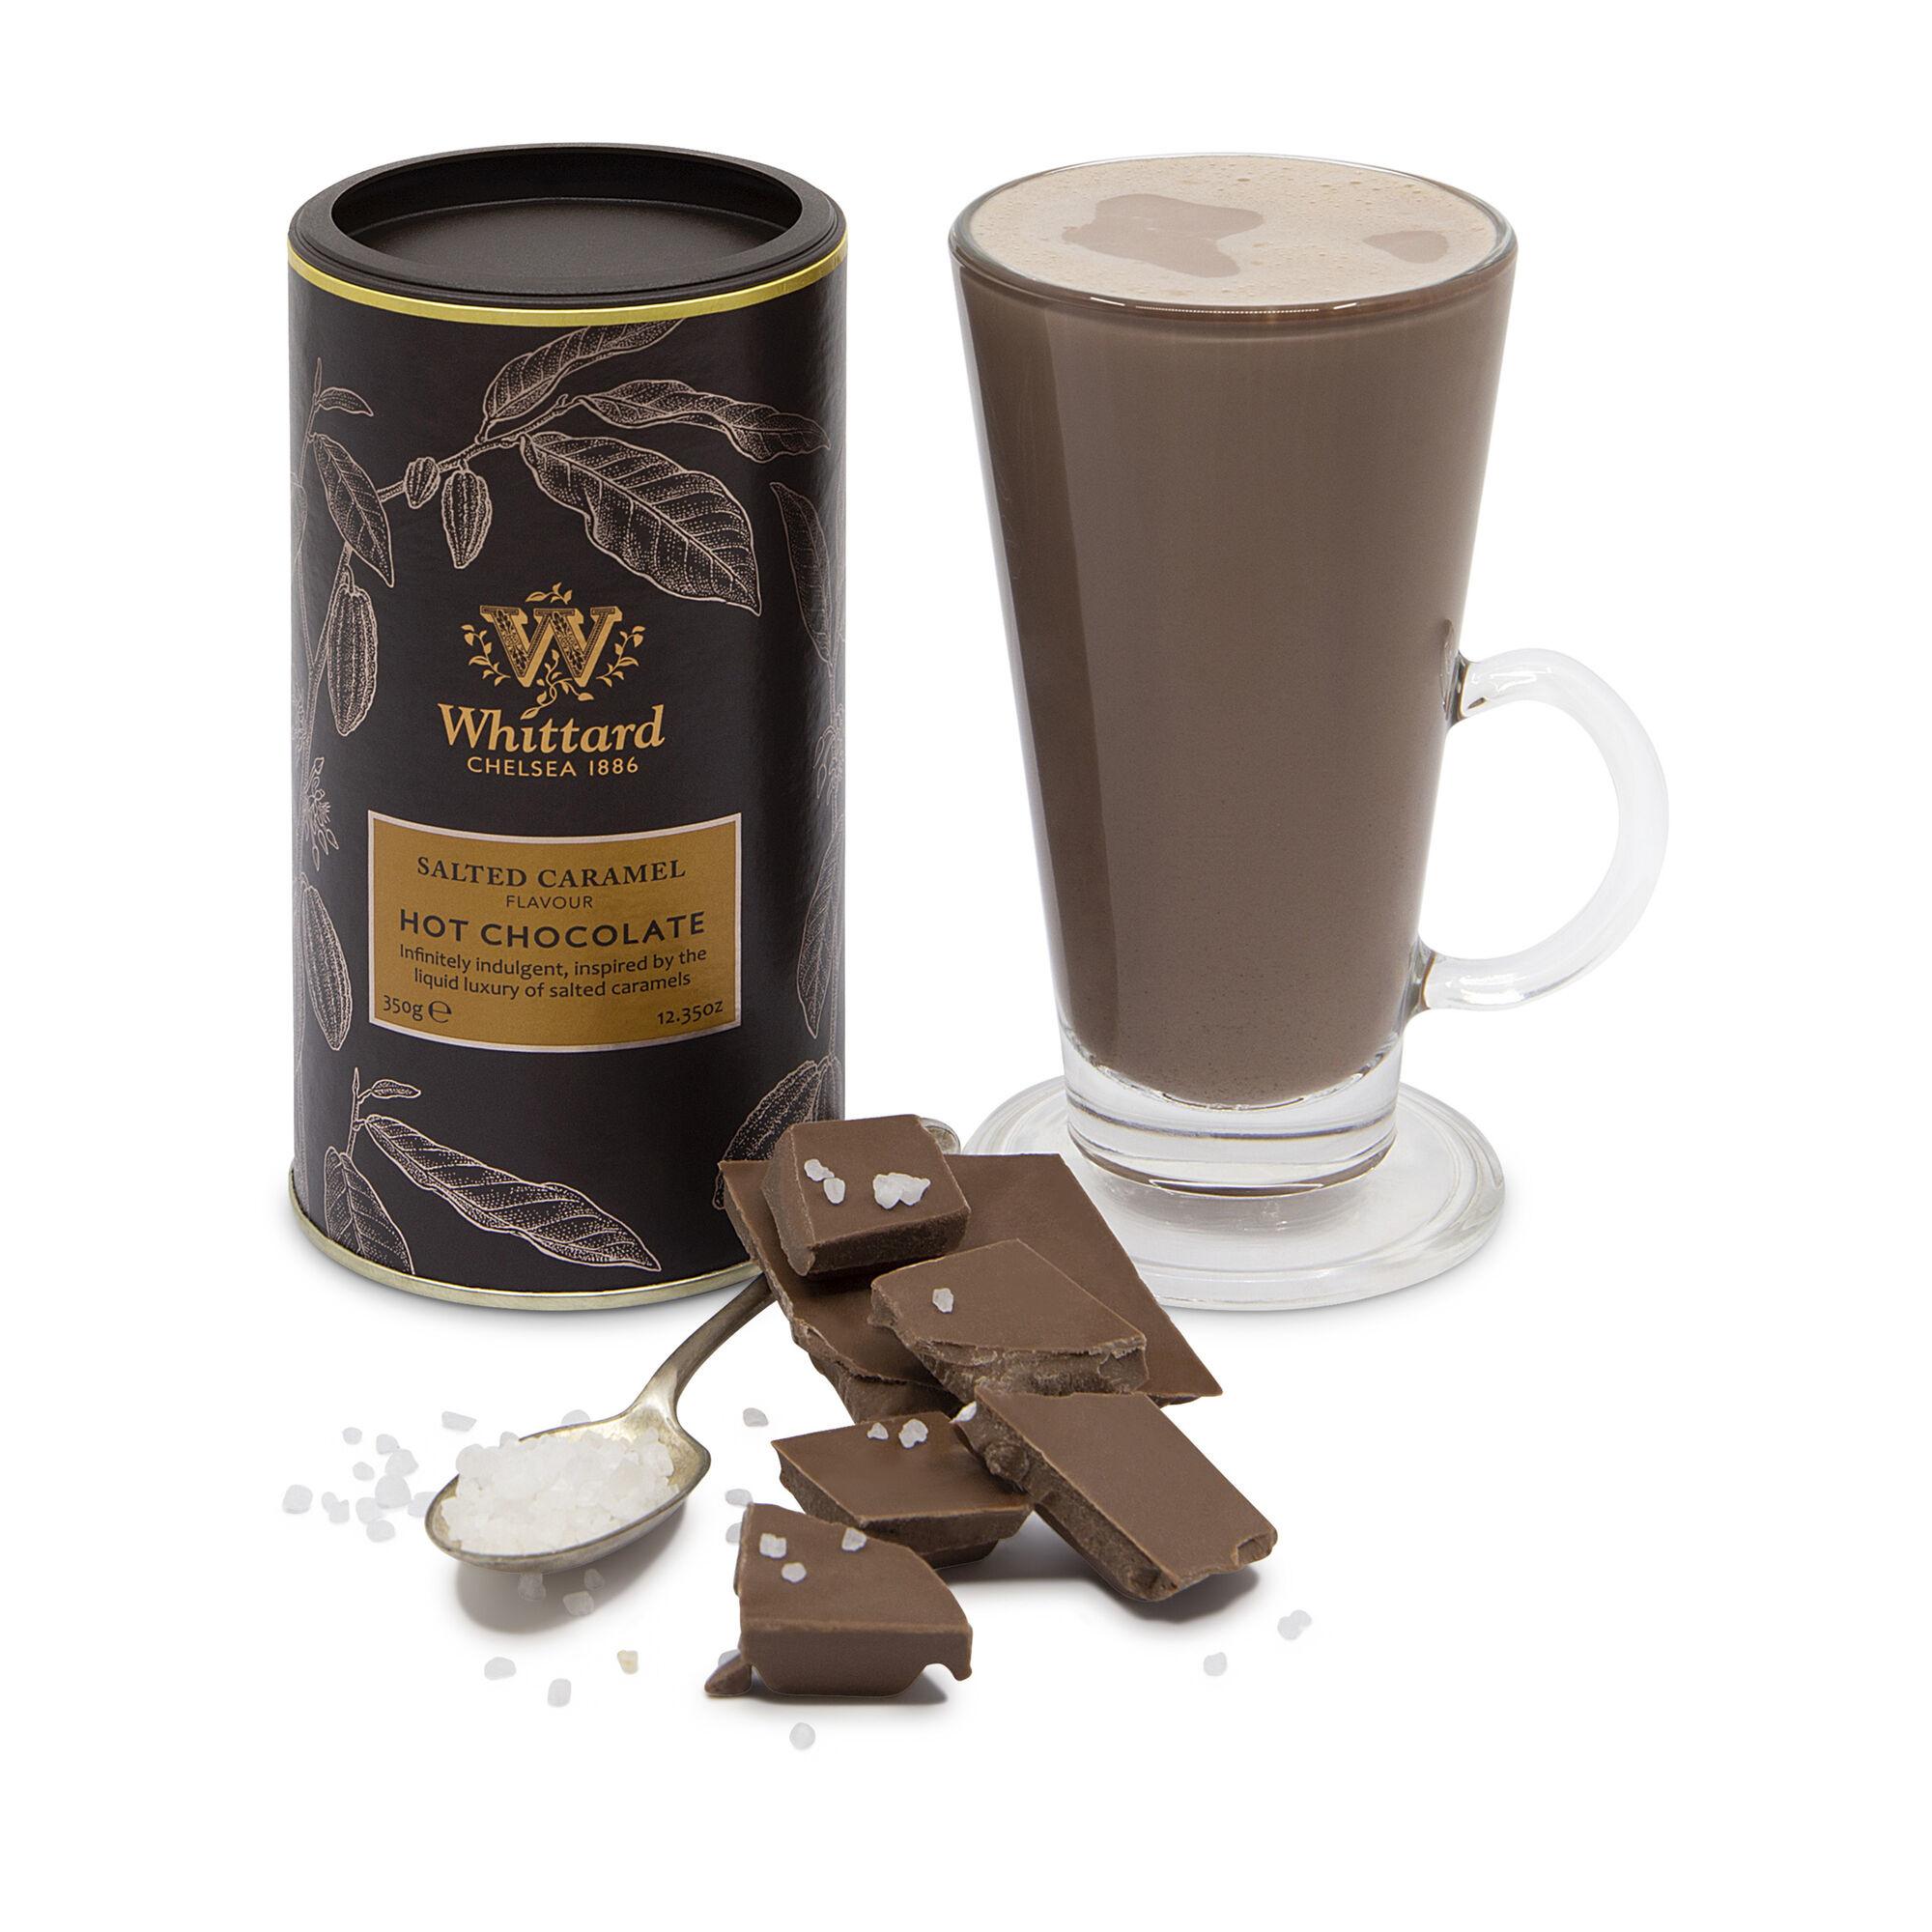 Whittard & Chelsea Salted Caramel Hot Chocolat 350gr